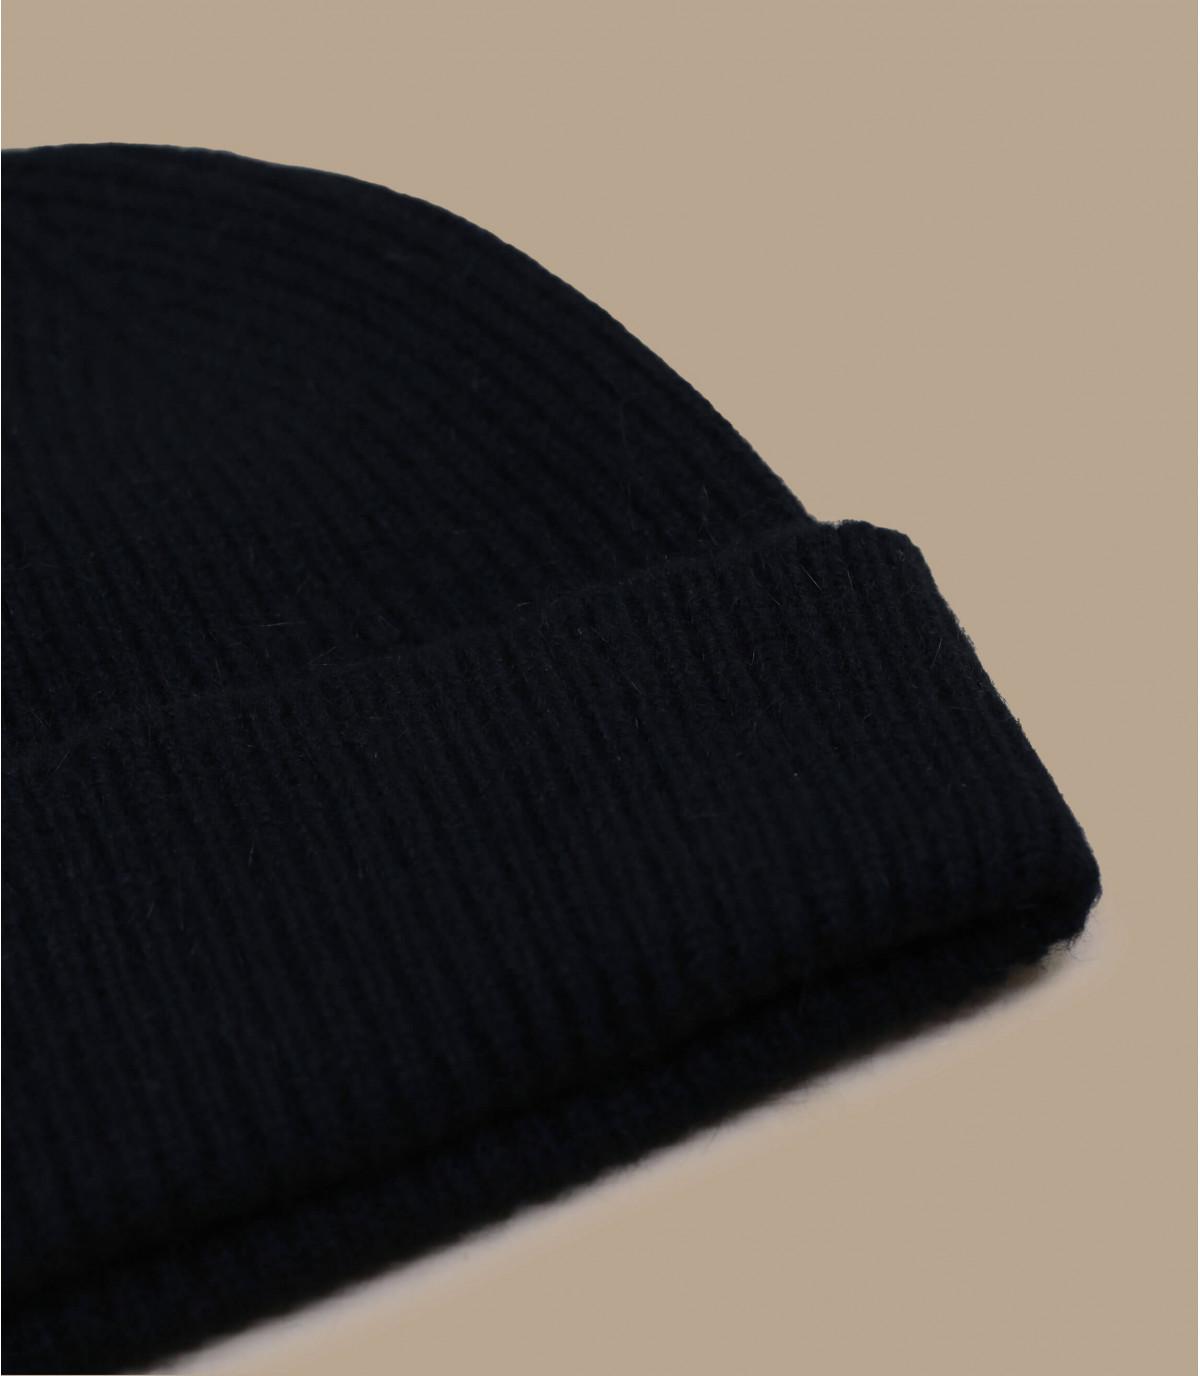 lana de angora gorro revés negro